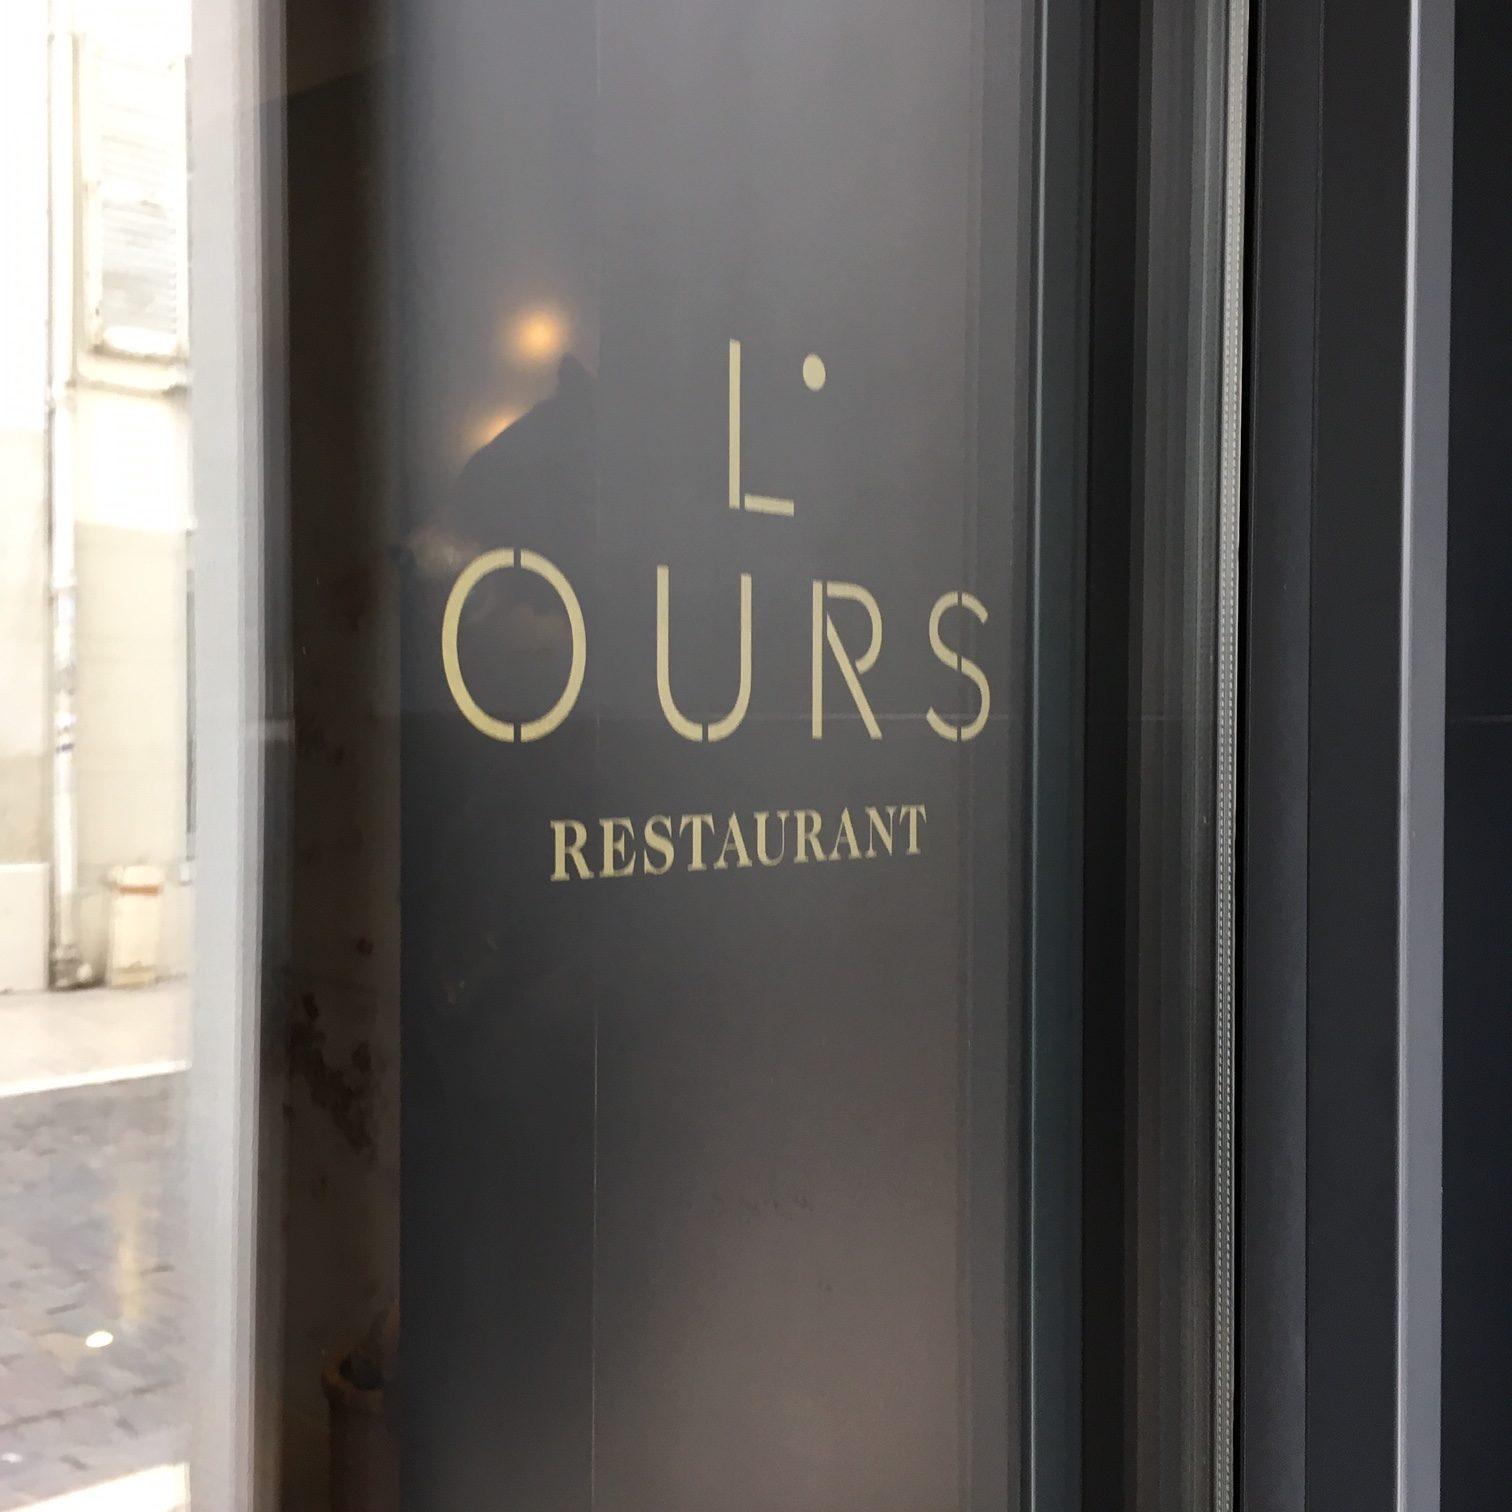 fouinzanardi -  loursrestaurant4_fouinzanardi